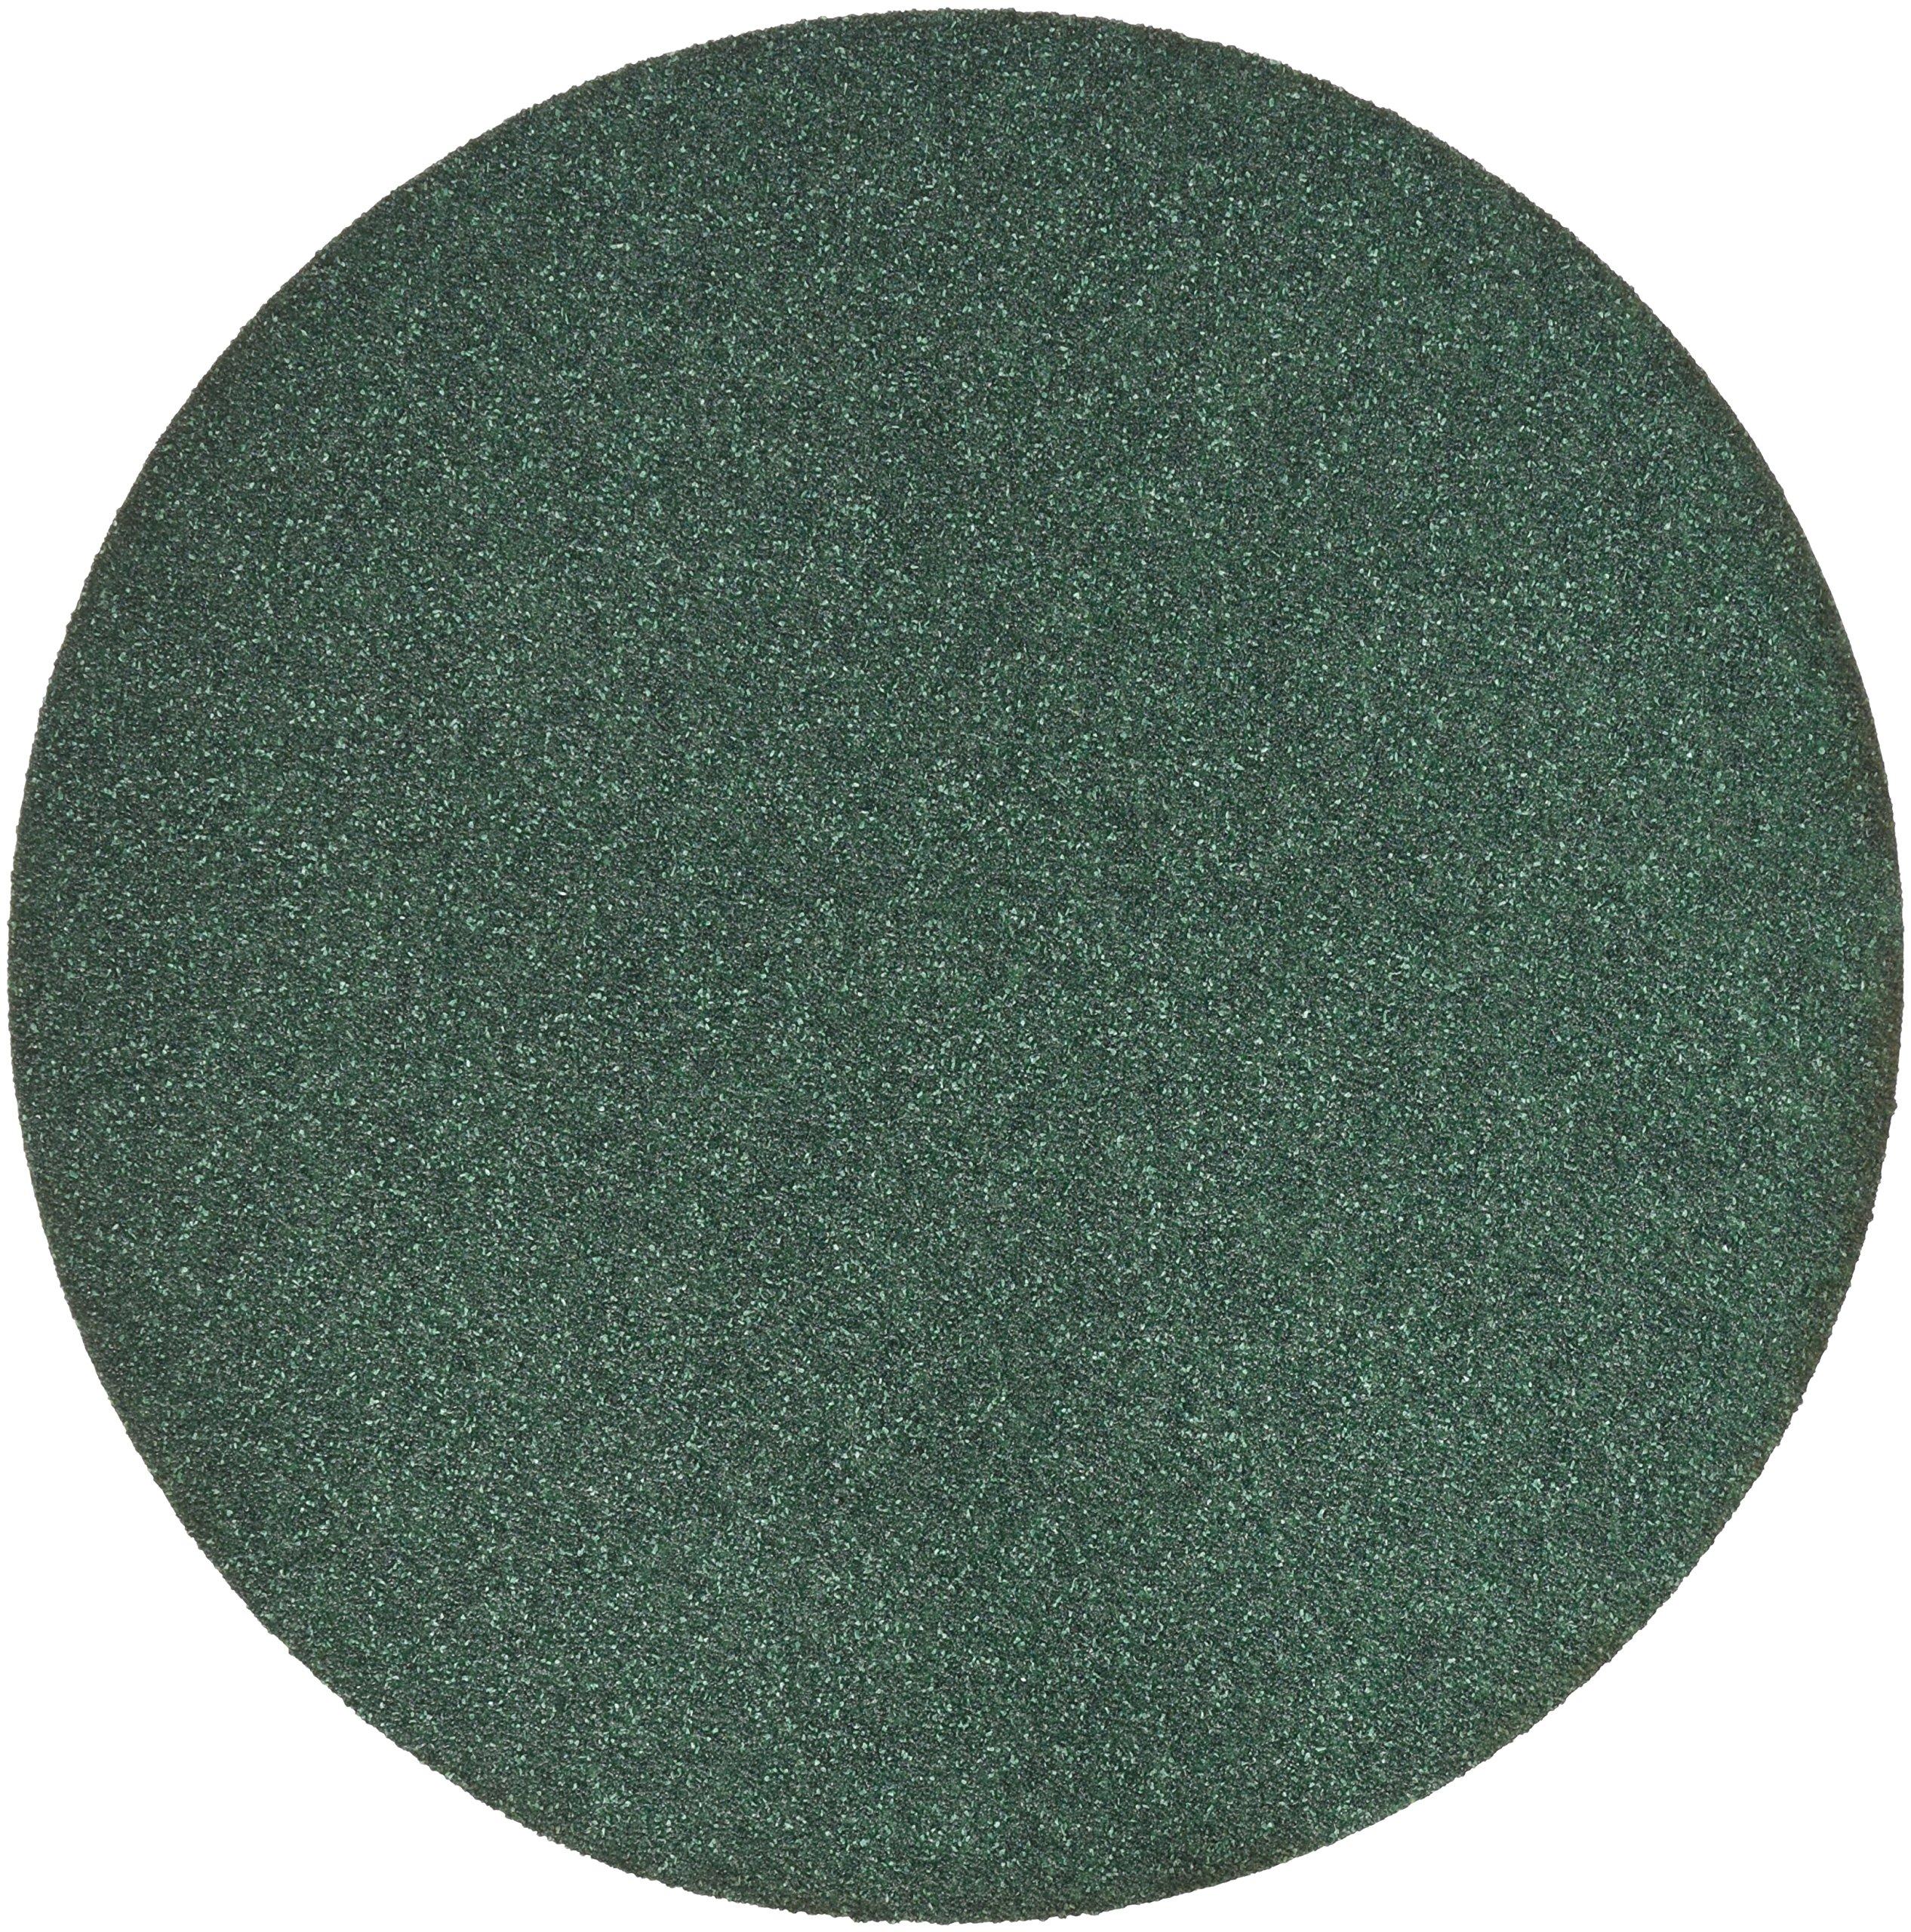 3M 00522 Green Corps Hookit 8'' 60E Grit Regalite Disc